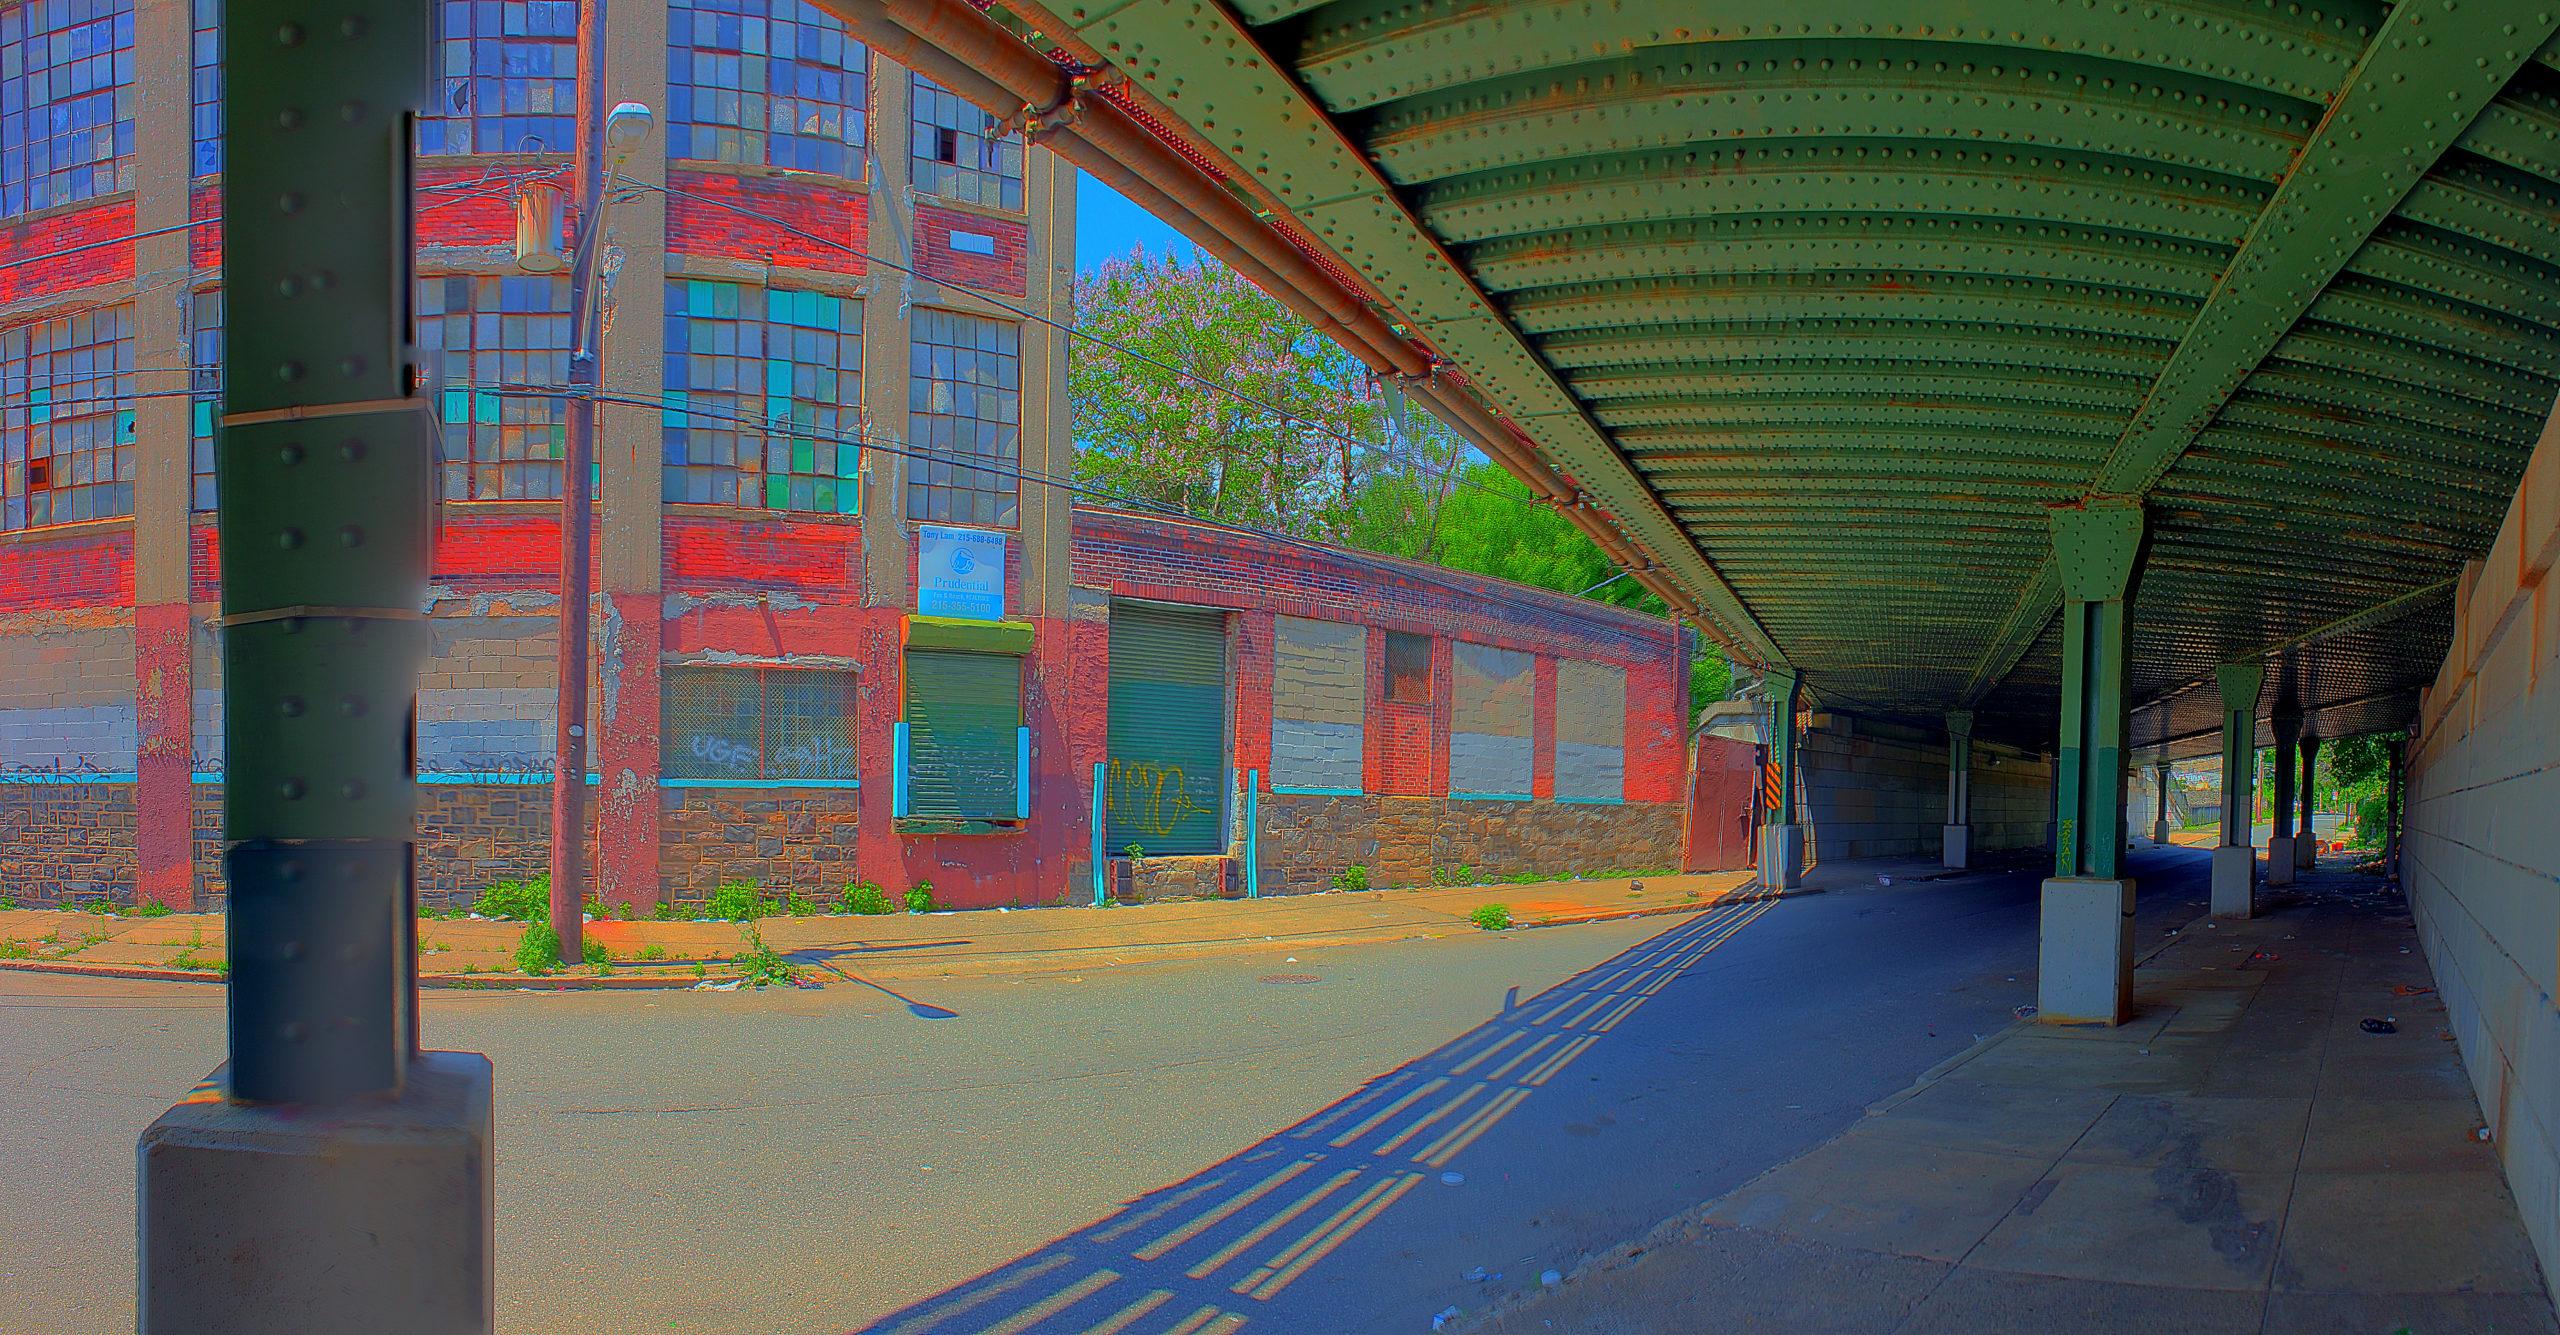 Reading Railroad Bridge 3306 N 19th Street Philadelphia, PA Copyright 2019, Bob Bruhin. All rights reserved.